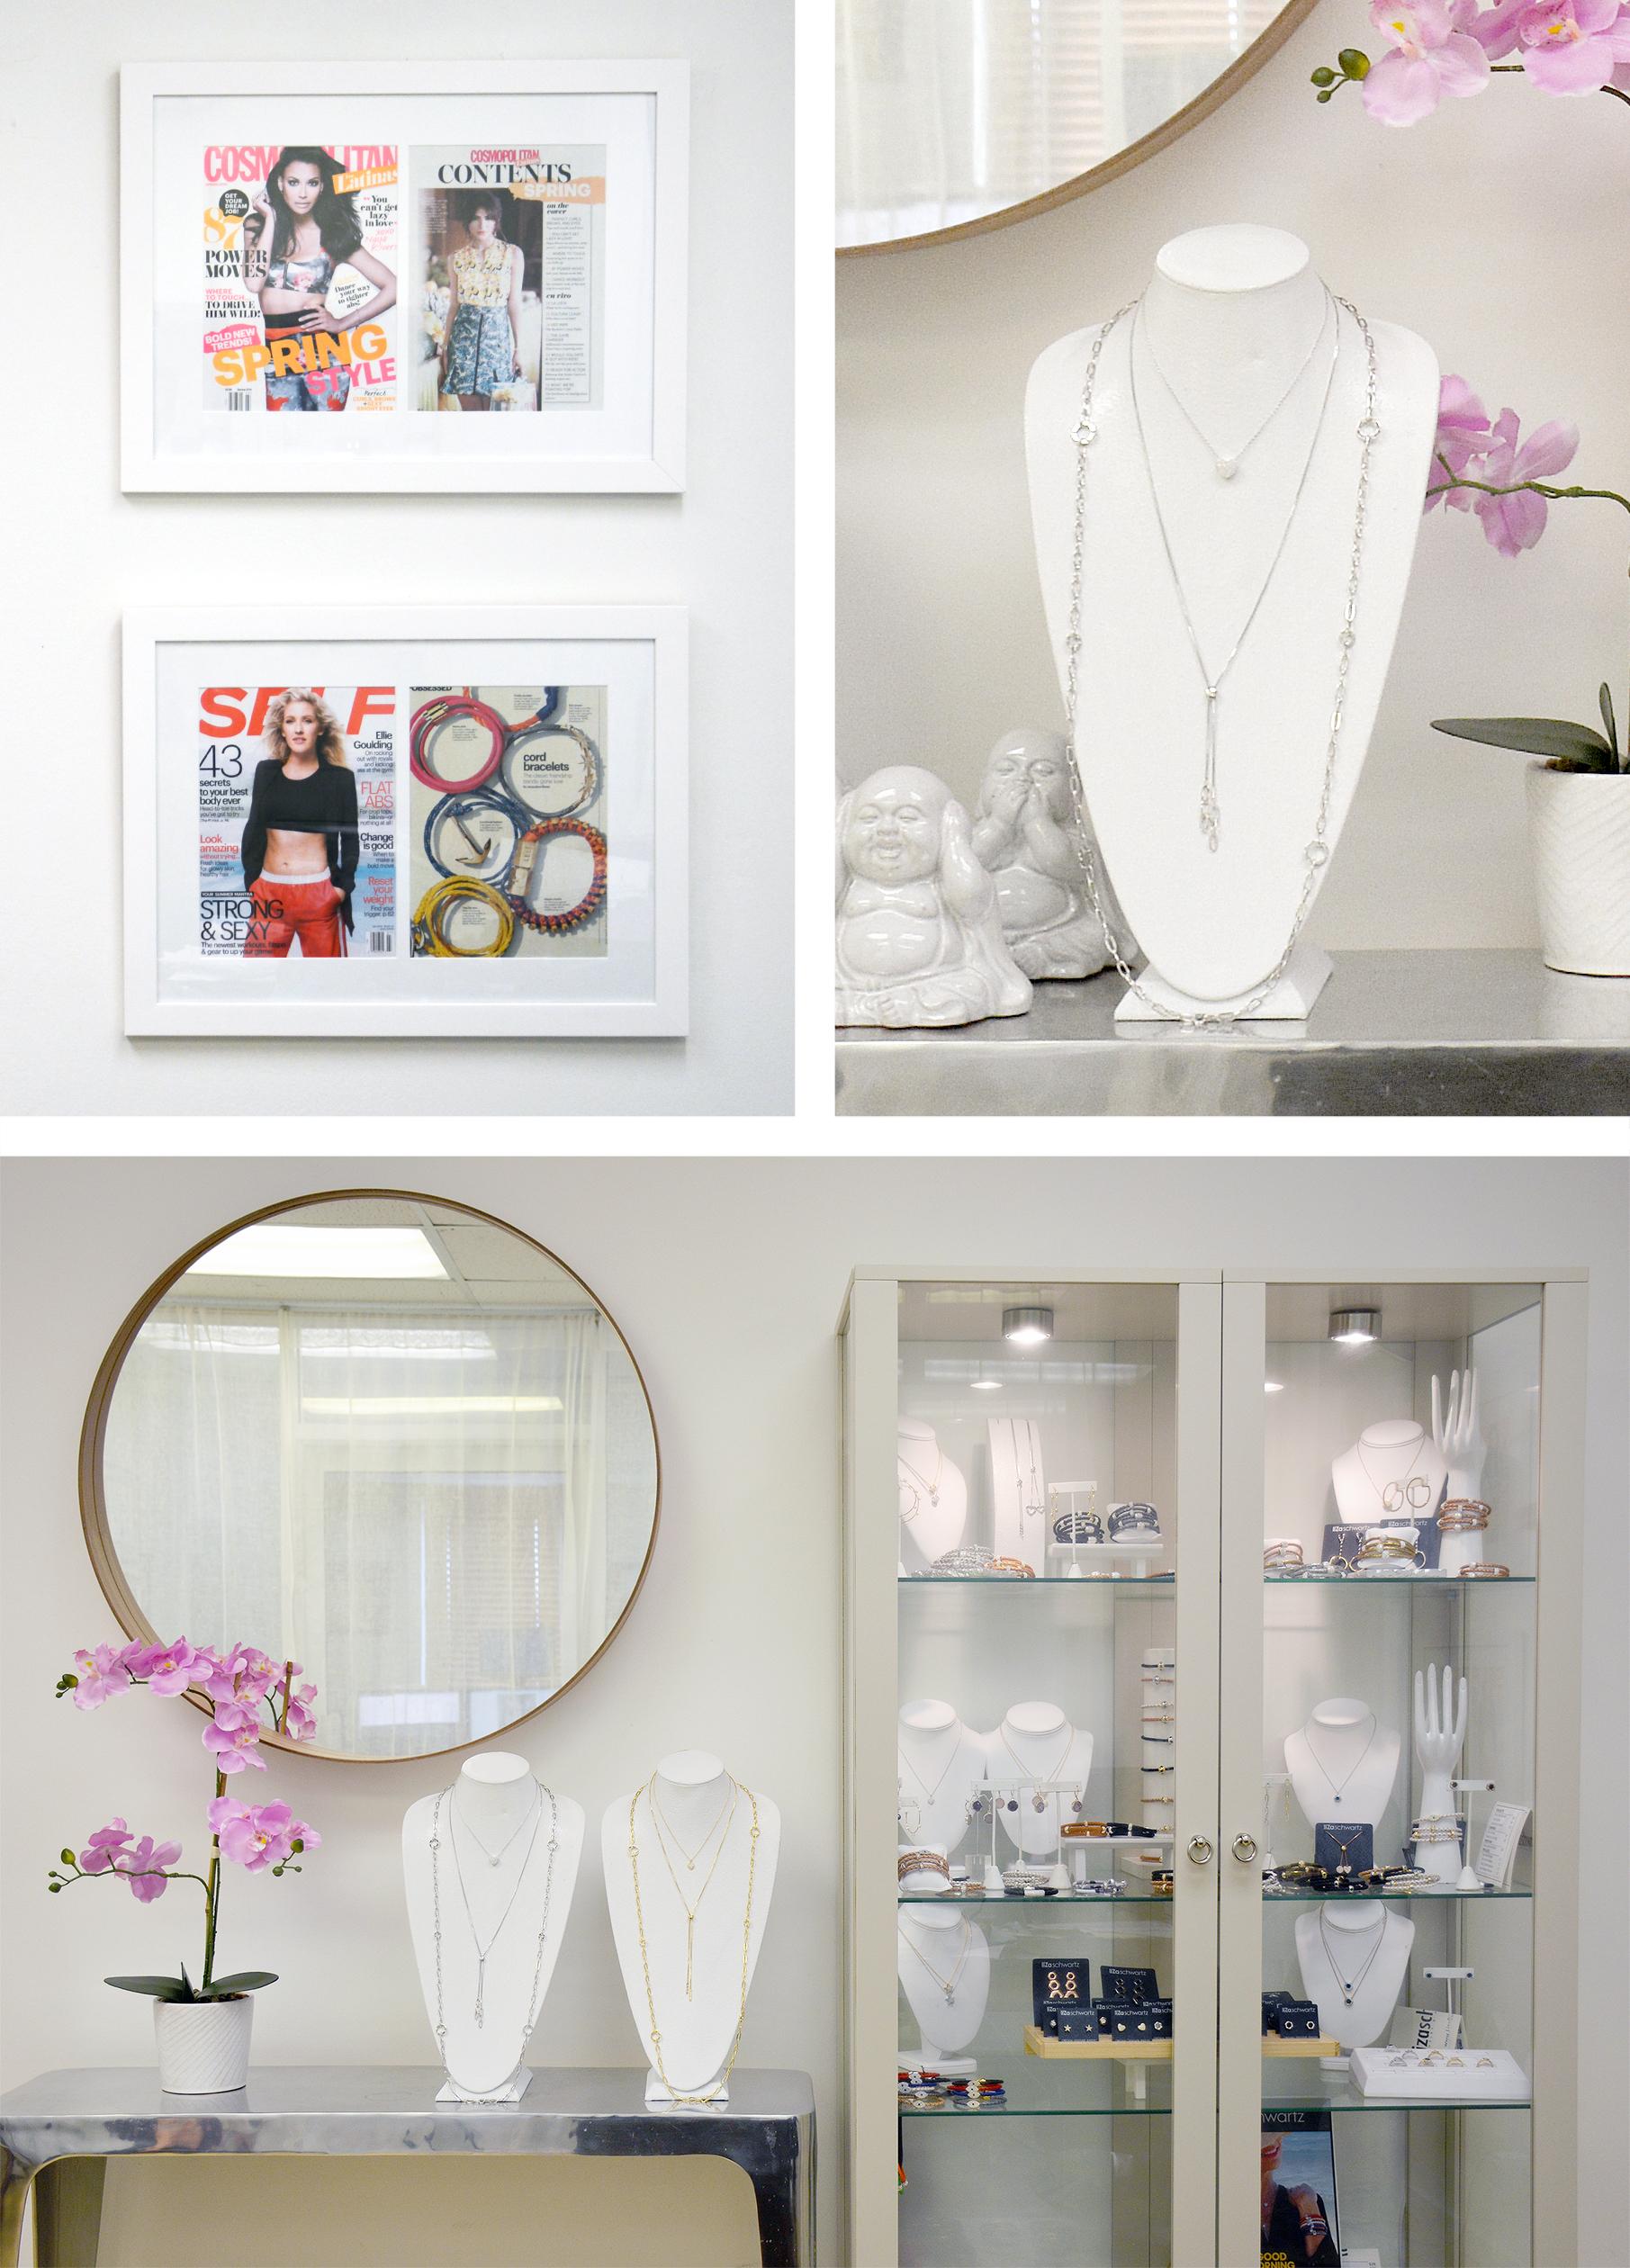 liza-showroom-image1.jpg